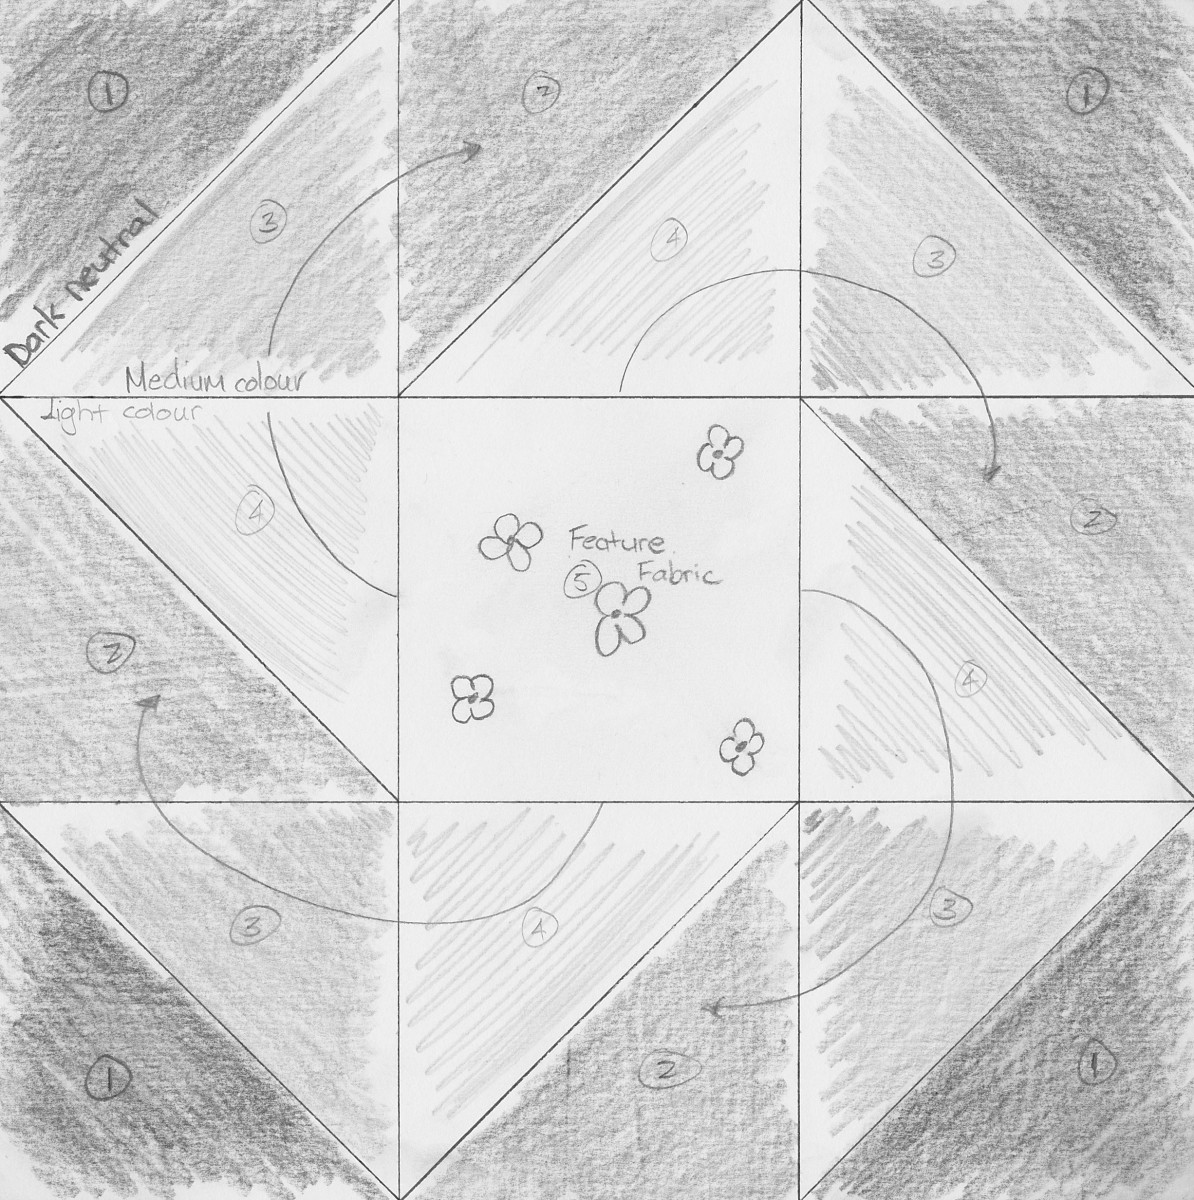 My quilt block design - grey-scale